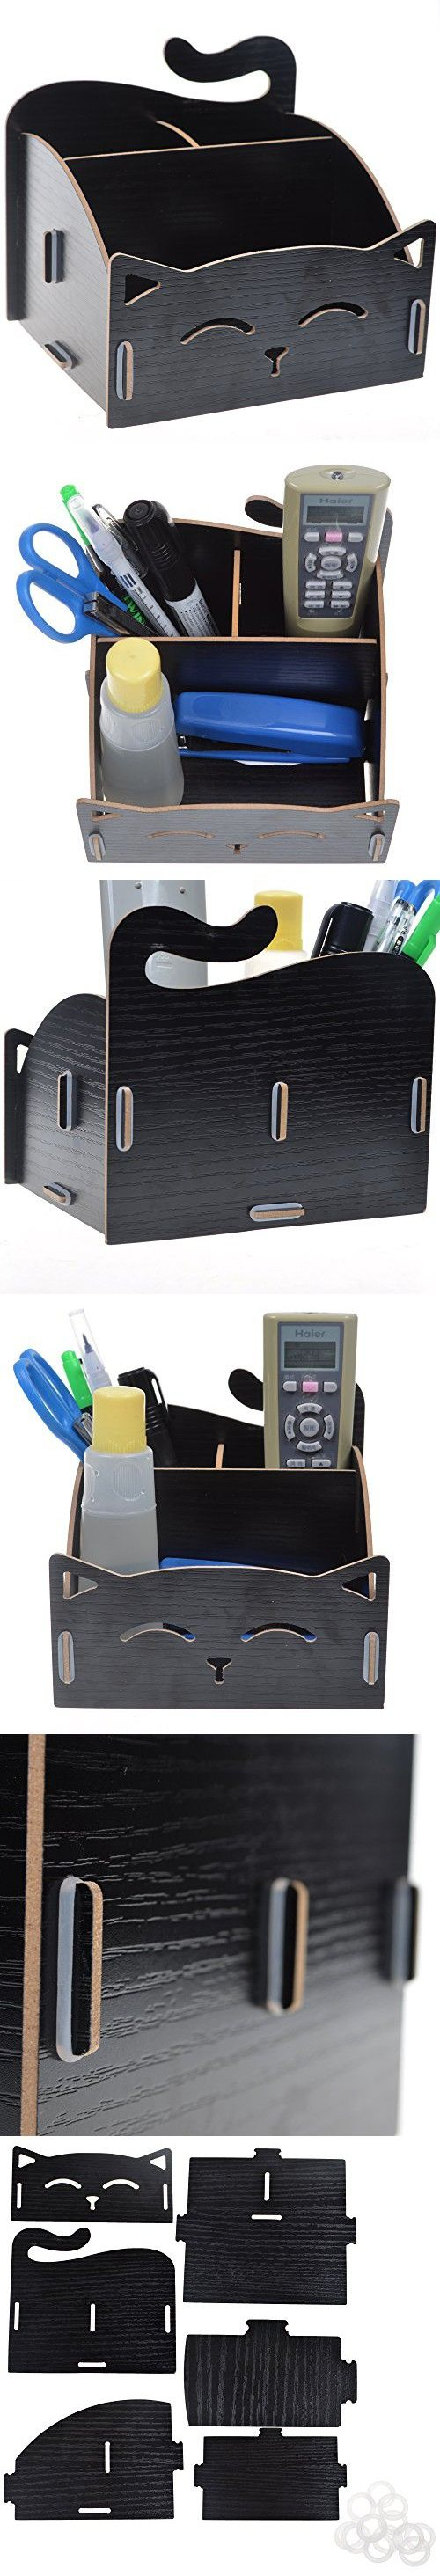 BCP Wood DIY Assemble Cute Cat Pen Pencil / Cosmetic Holder Desk Organizer for Home, Office (Black Color)